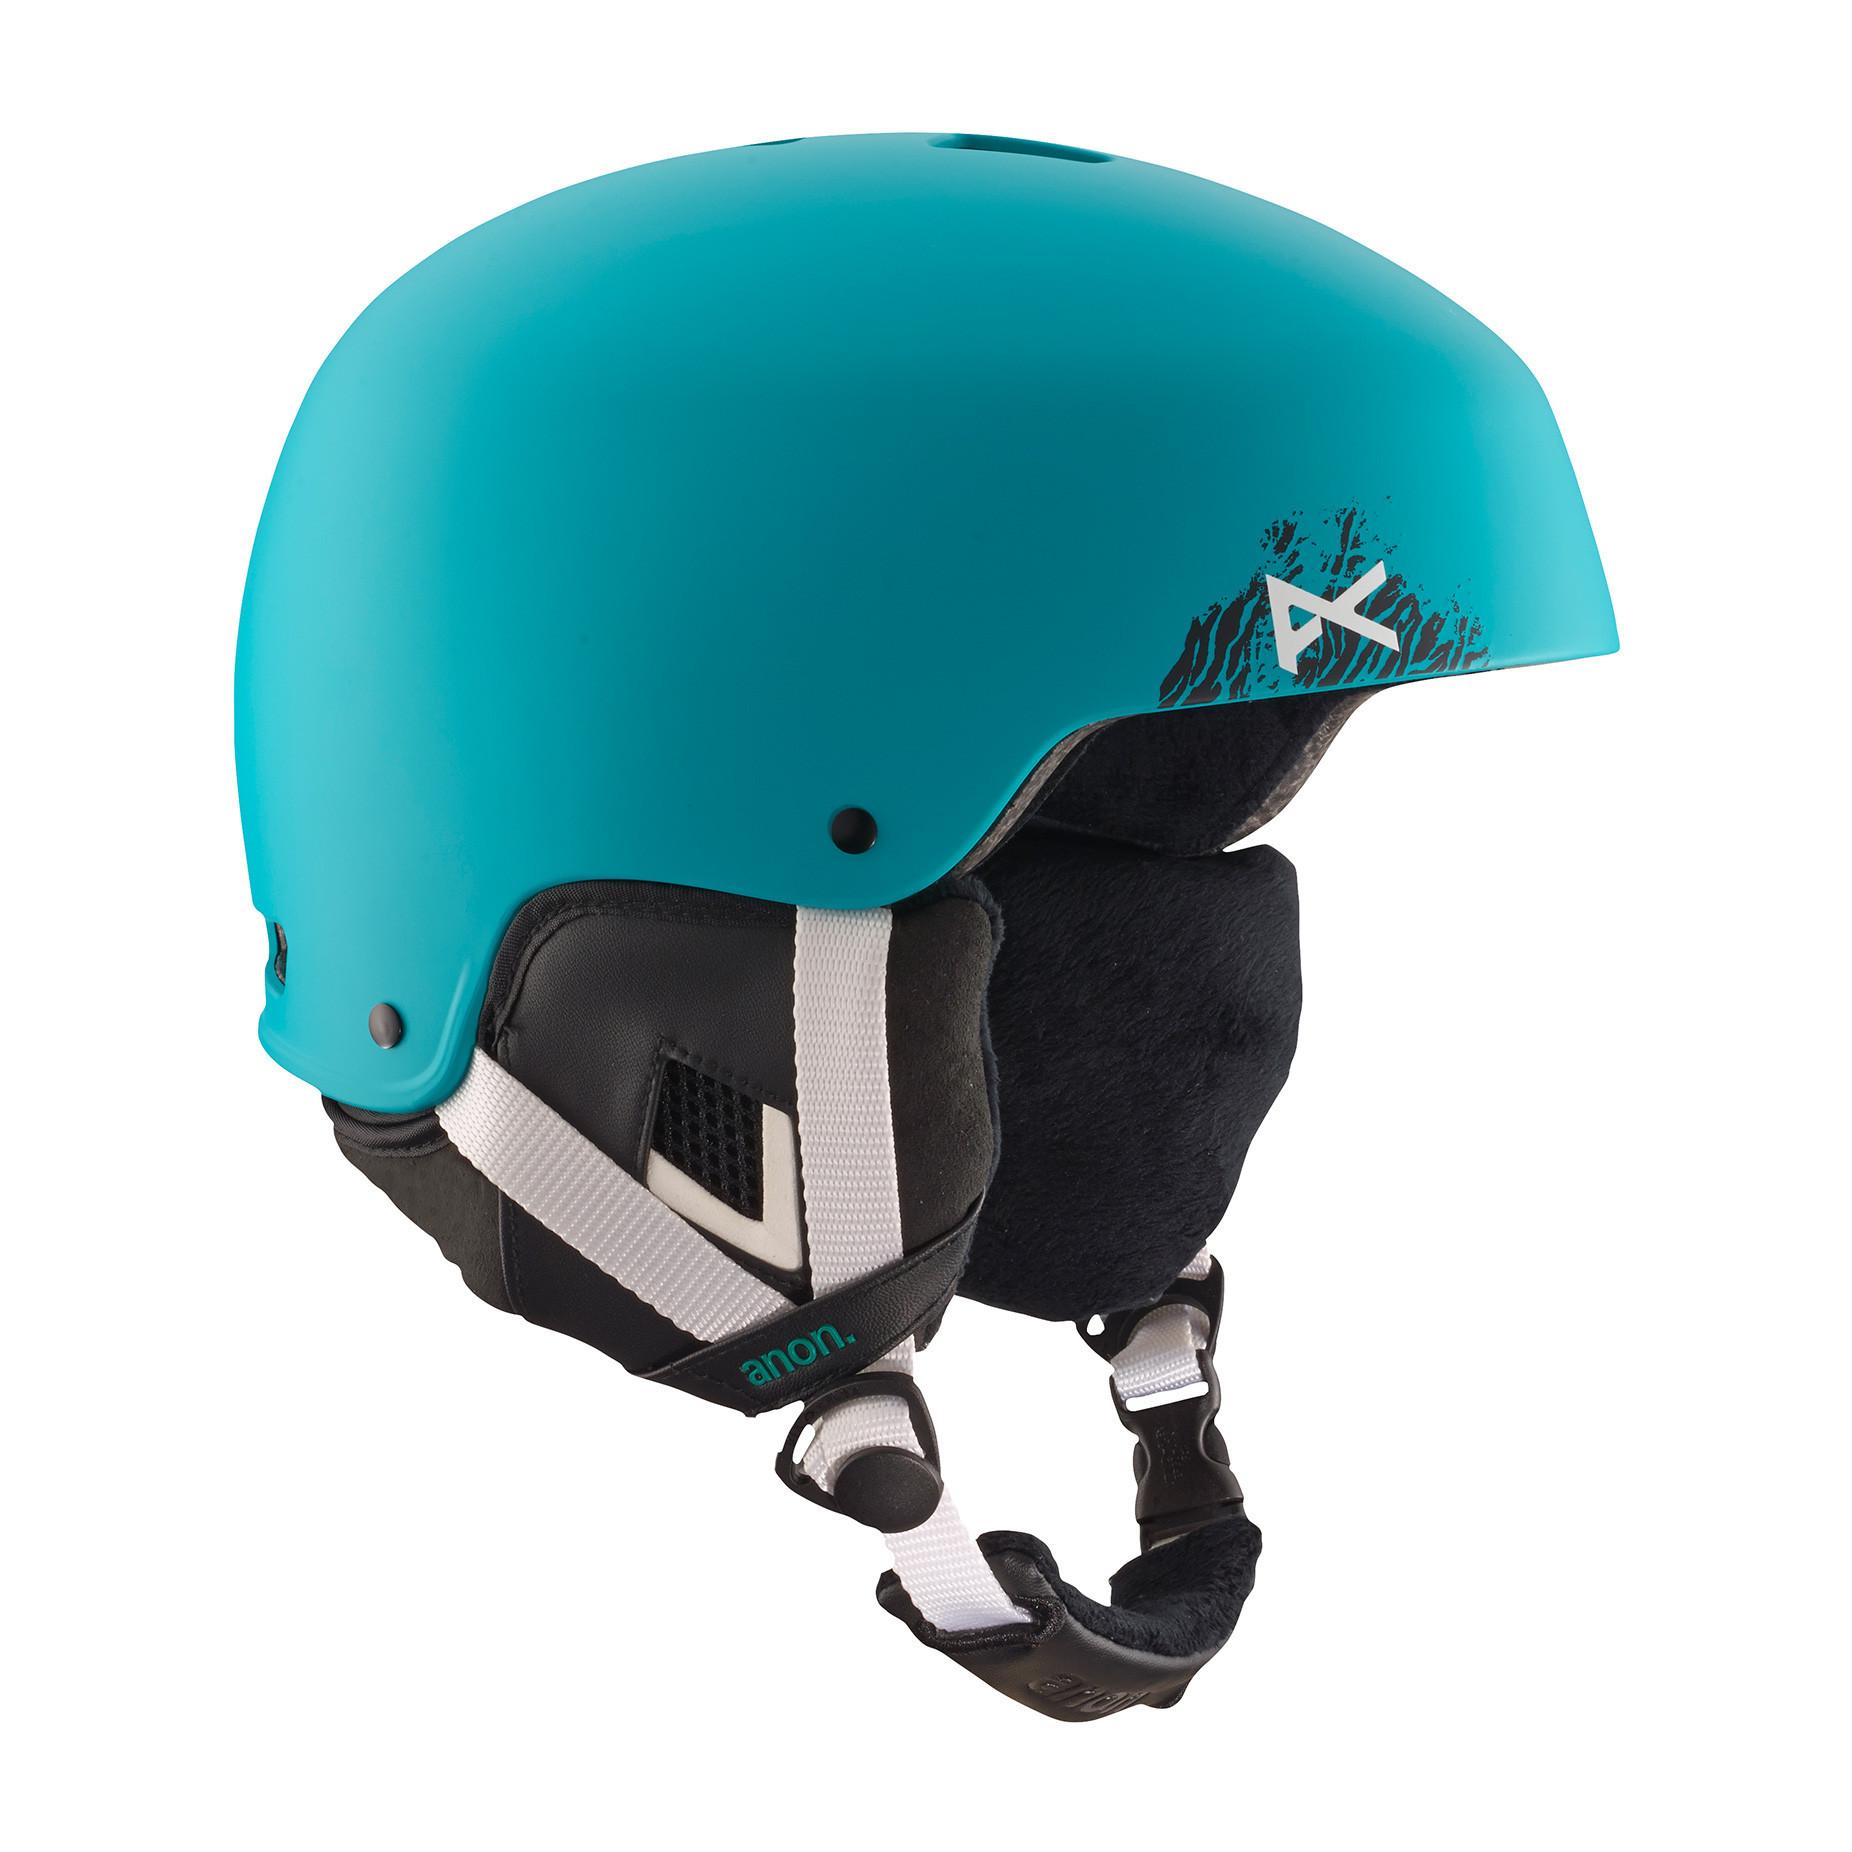 anon. Lynx Women s Snowboard Helmet - Mowgli Teal a6fcd306b9